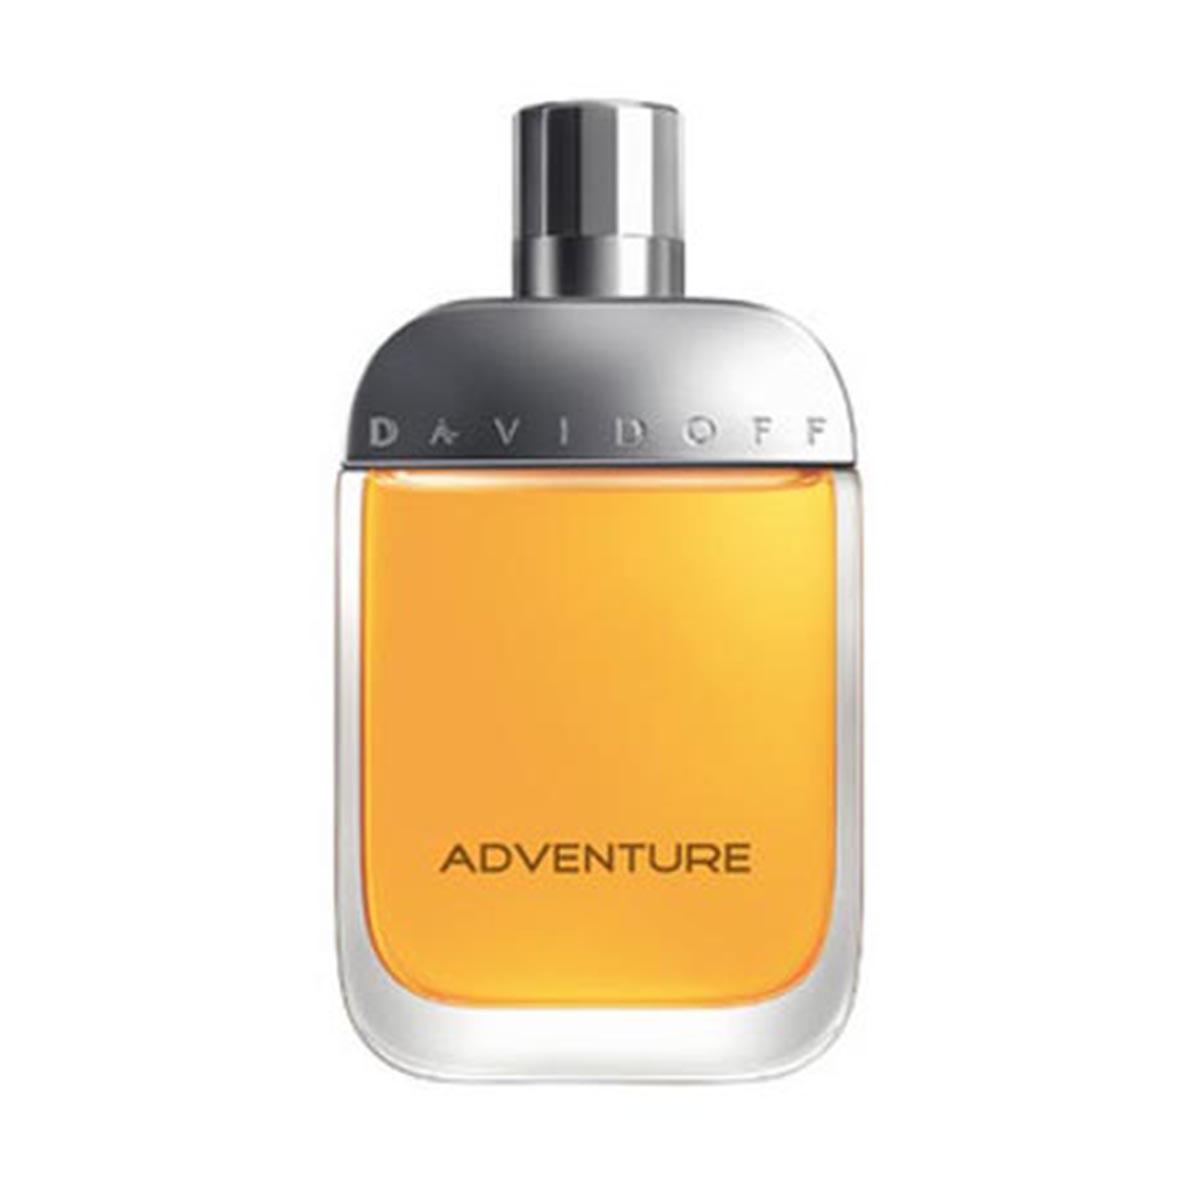 Davidoff adventure eau de toilette 100ml vaporizador